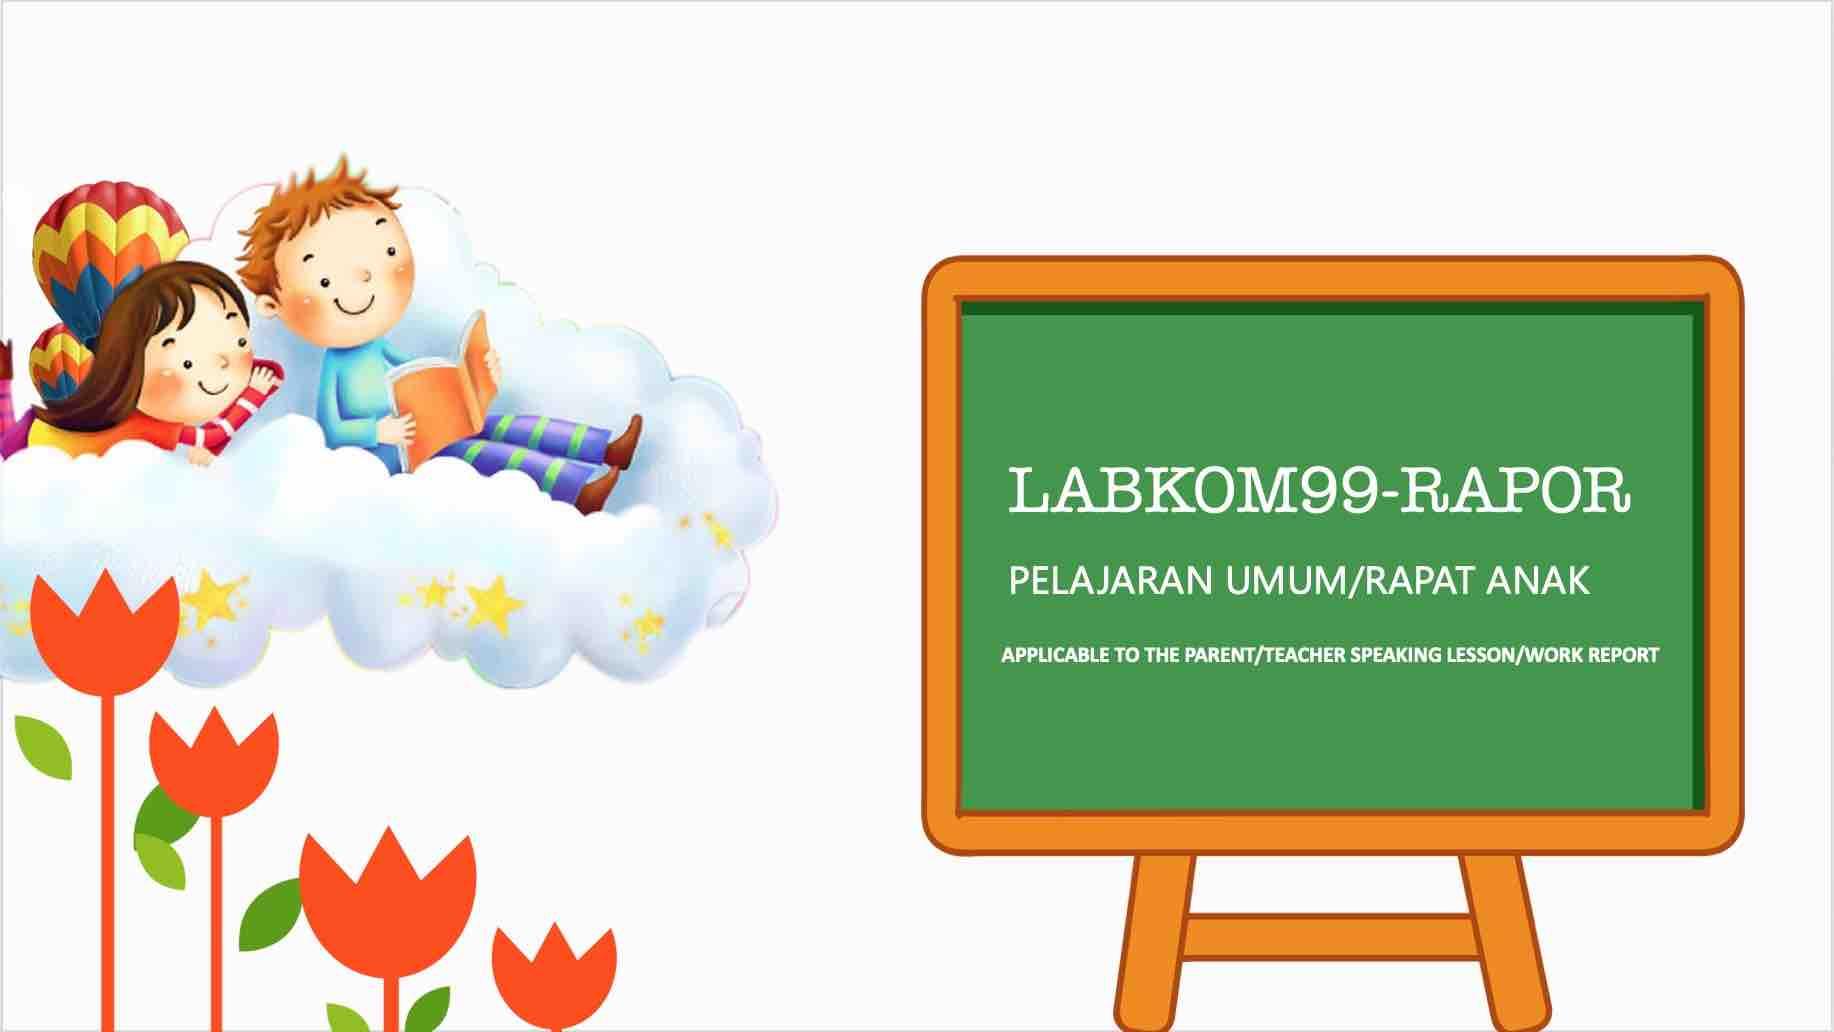 Labkom99-rapor